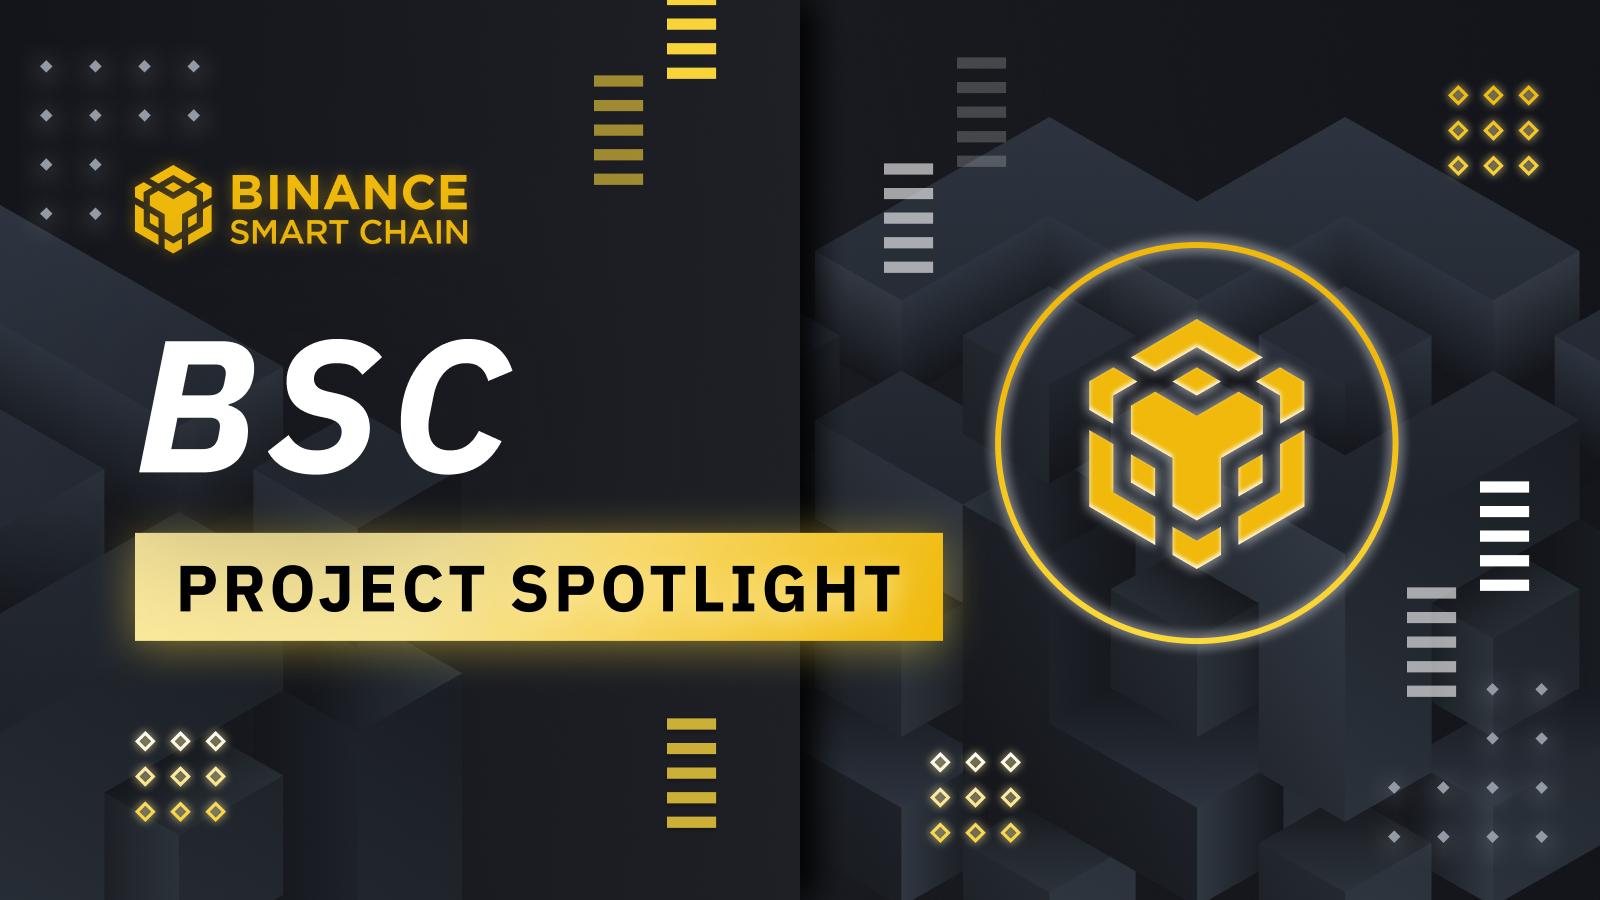 BSC Project Spotlight: MOBOX